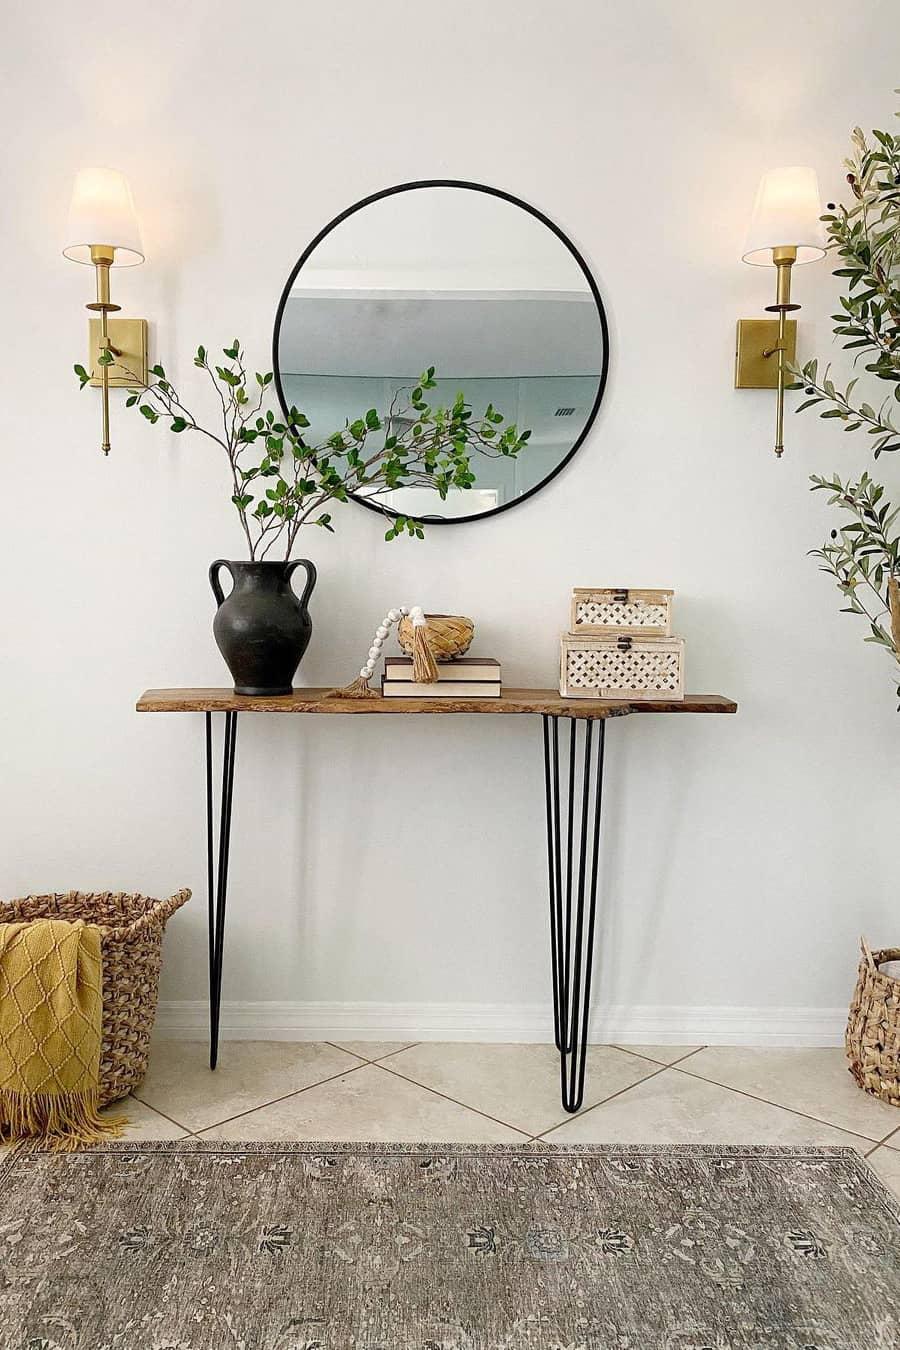 Lightweight decor